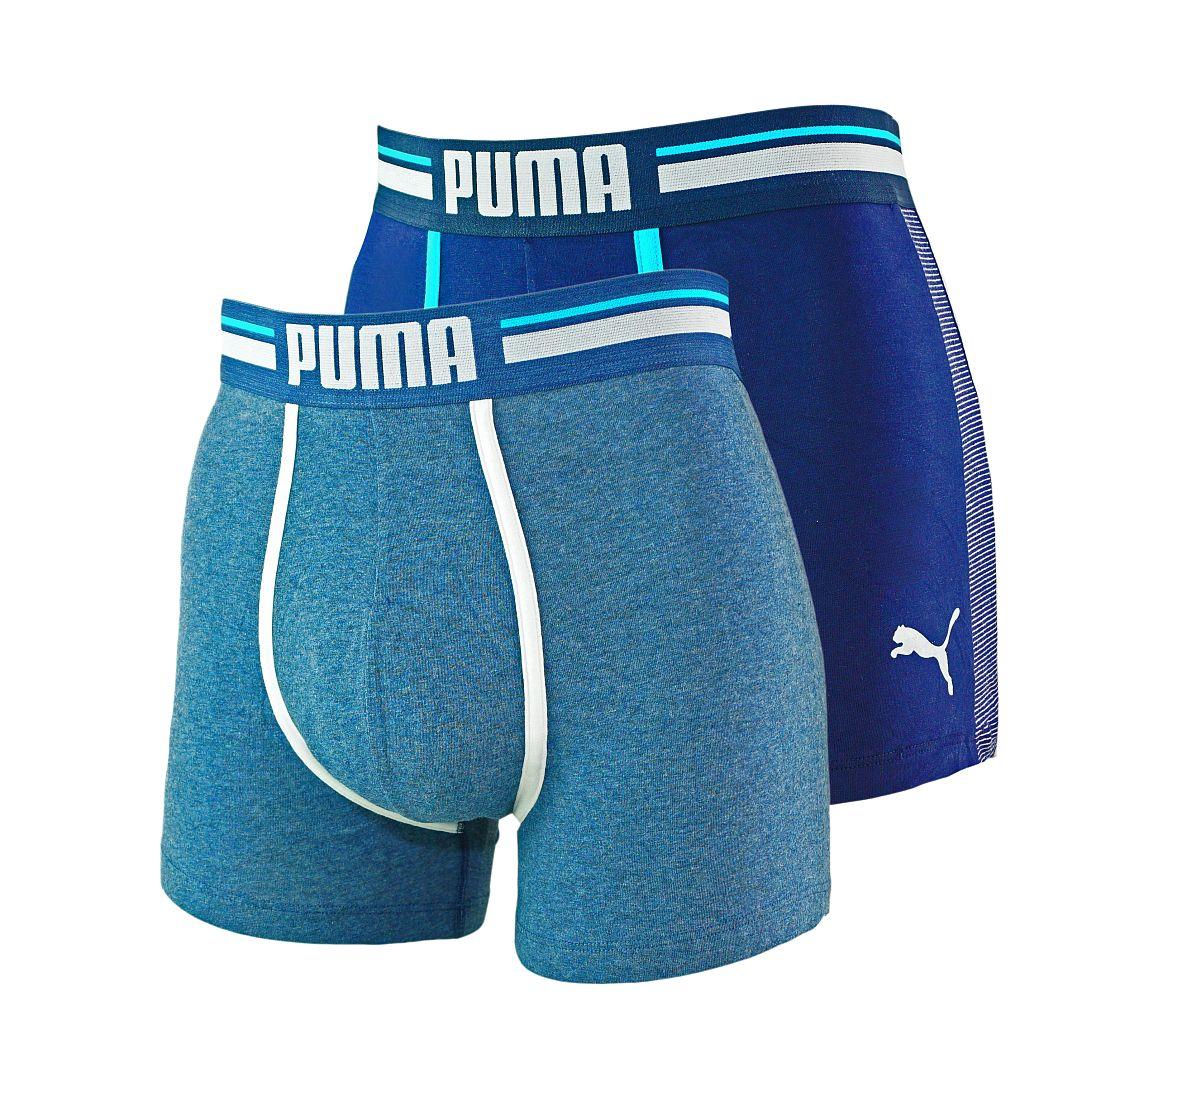 PUMA Shorts Unterhosen 2er Pack Boxer 571005001 056 020 blue SF17-PMS1